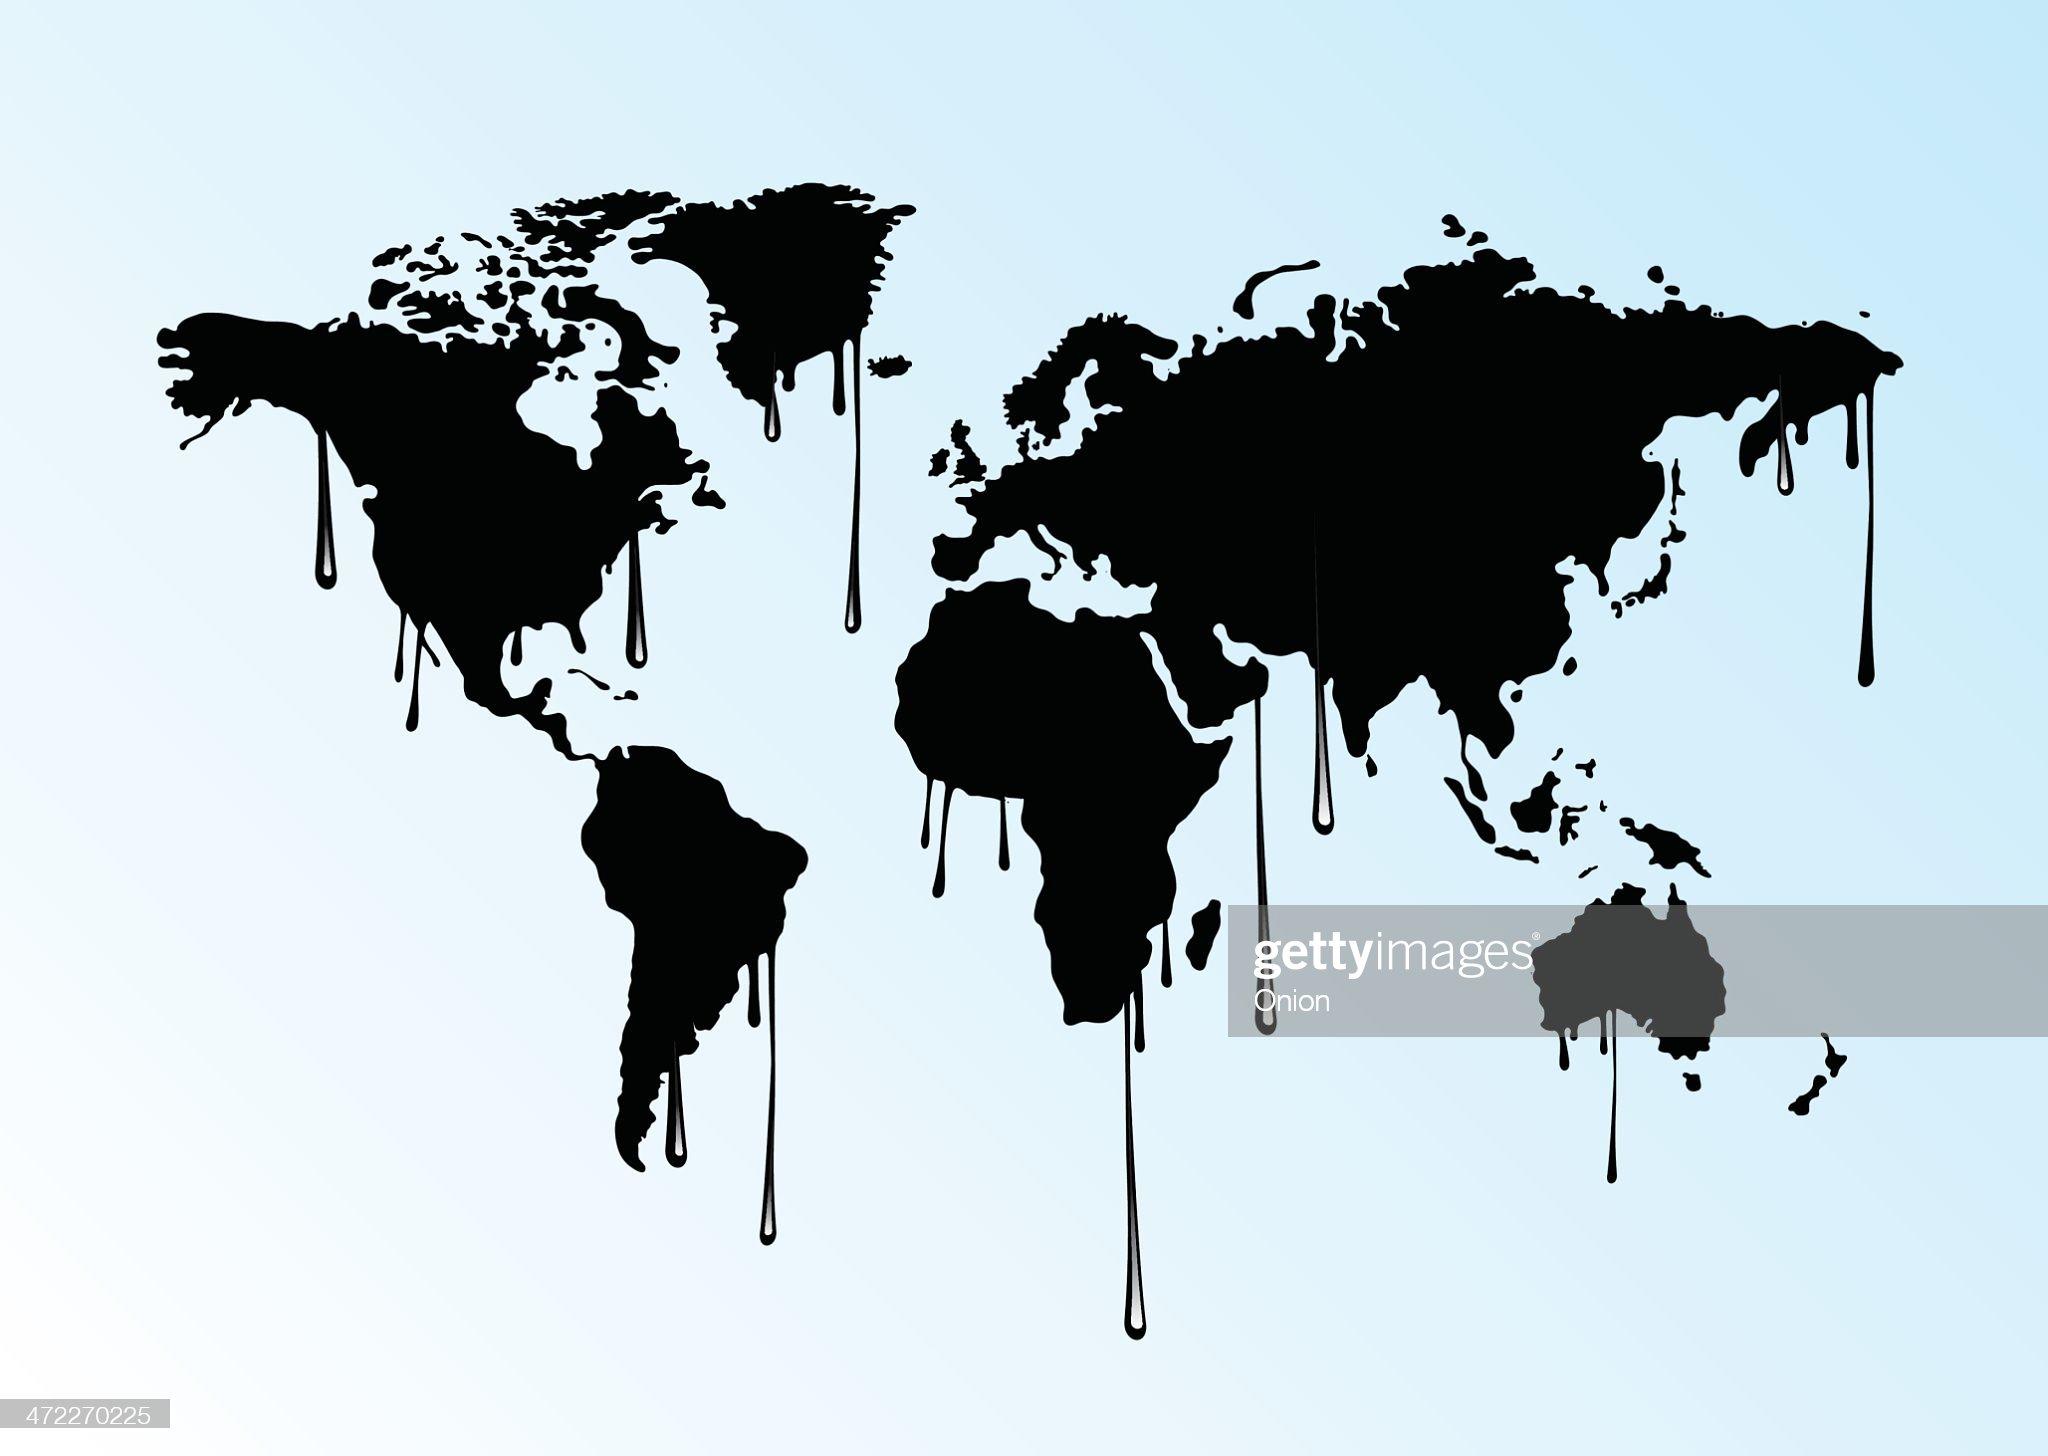 Huile monde entier : Illustration